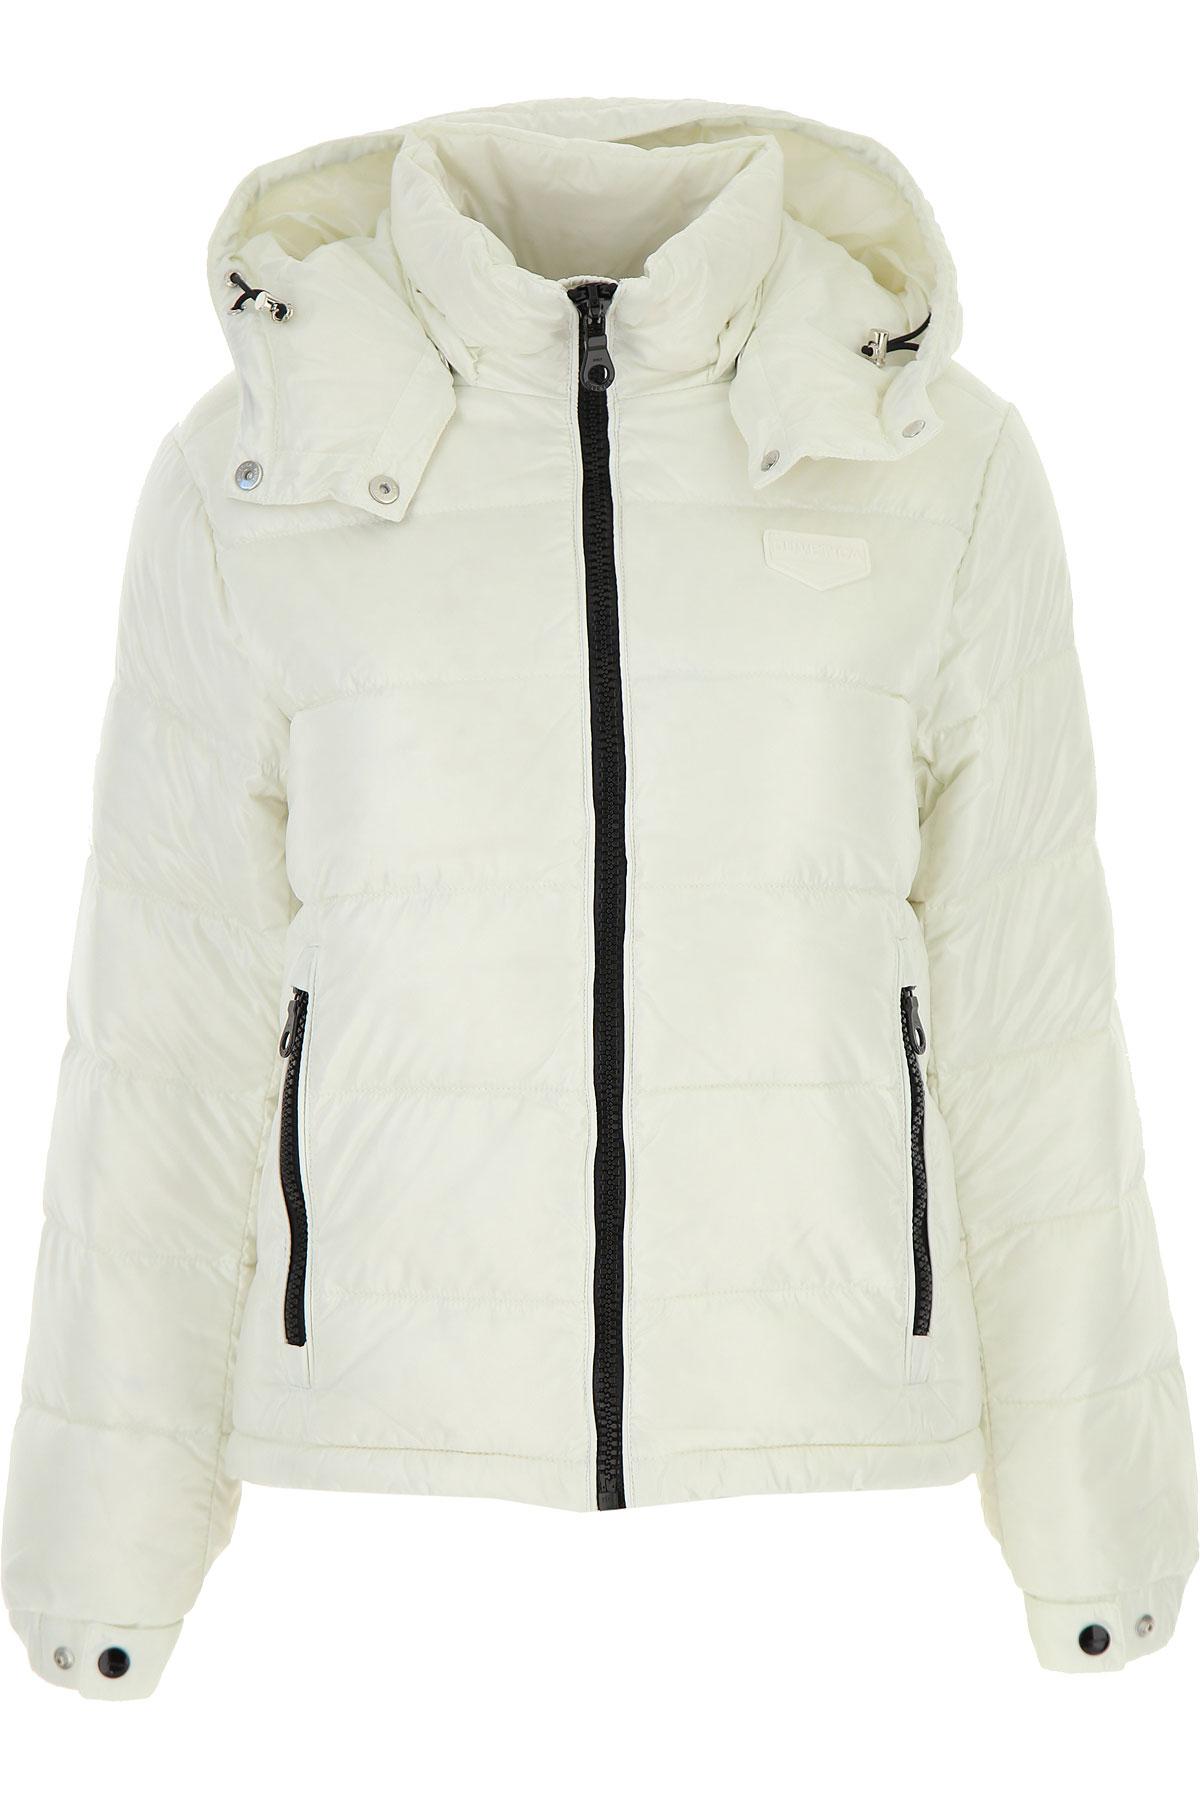 Duvetica Down Jacket for Women, Puffer Ski Jacket On Sale, White, Down, 2019, 2 4 6